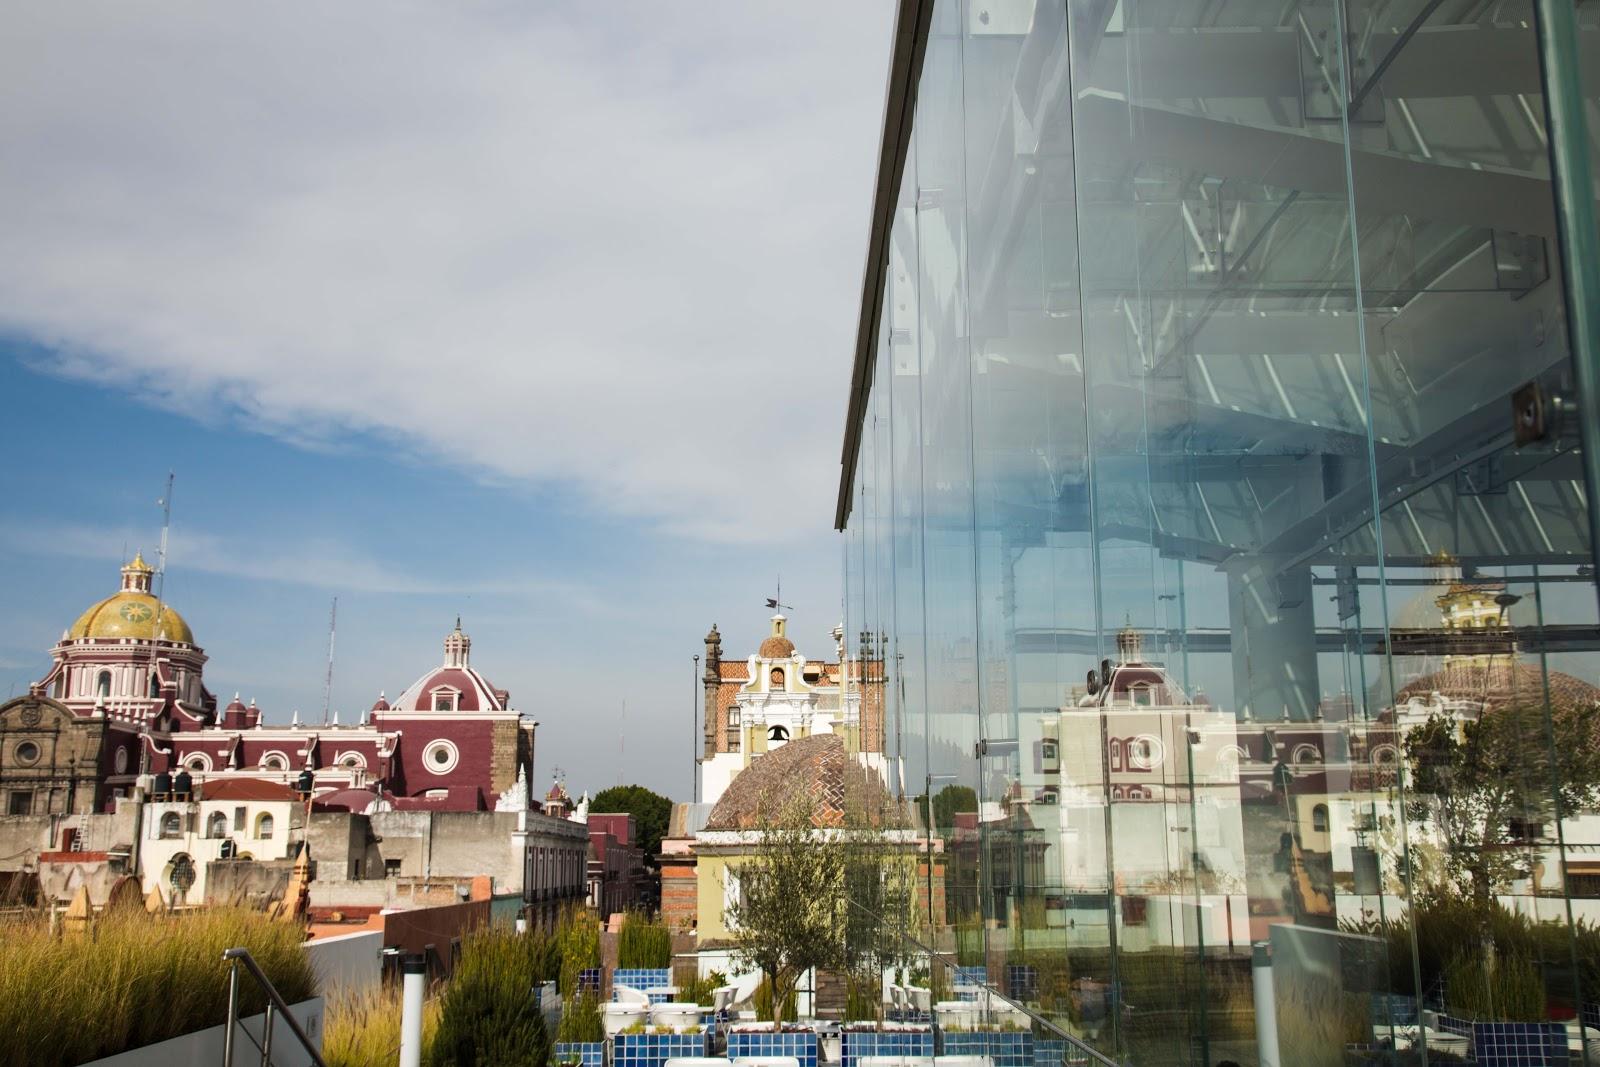 Museo-Amparo-7.jpg